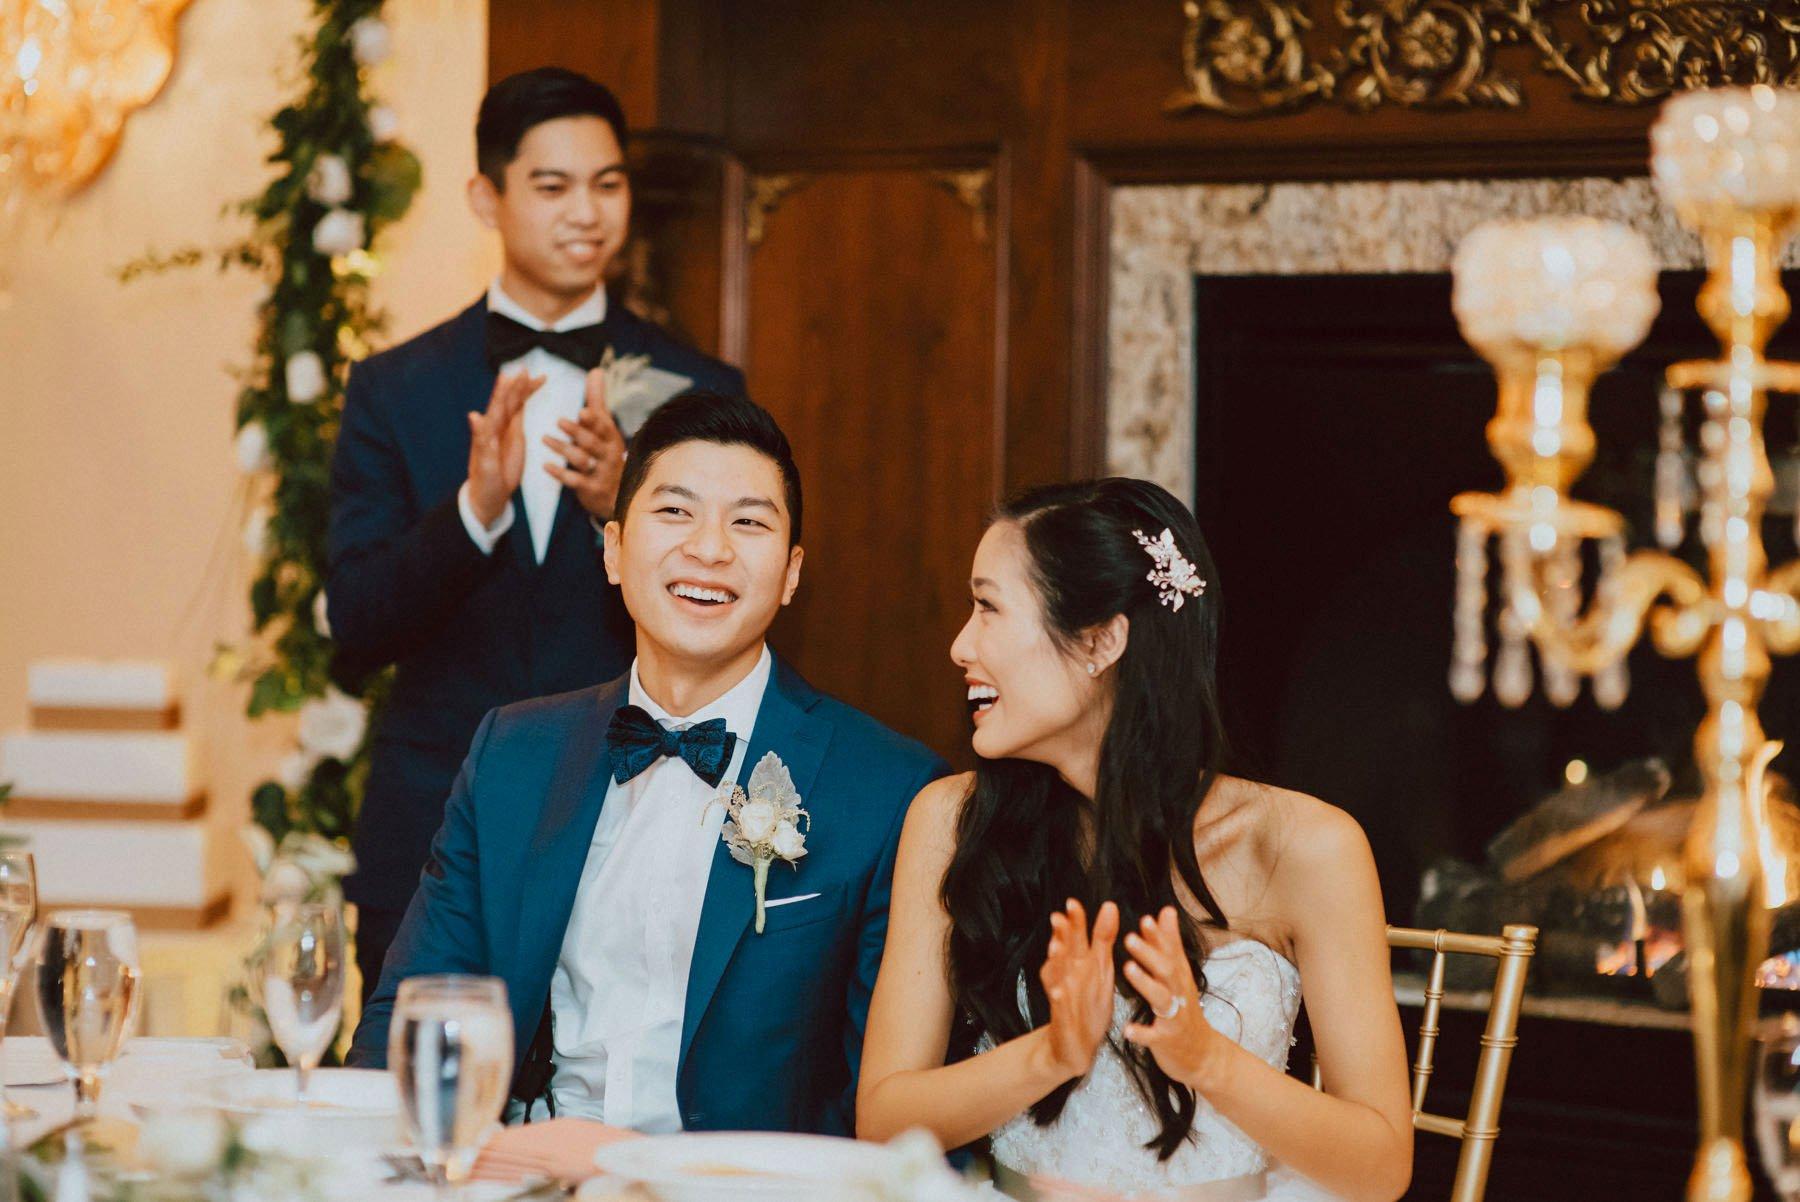 philadelphia-wedding-photographer-147.jpg